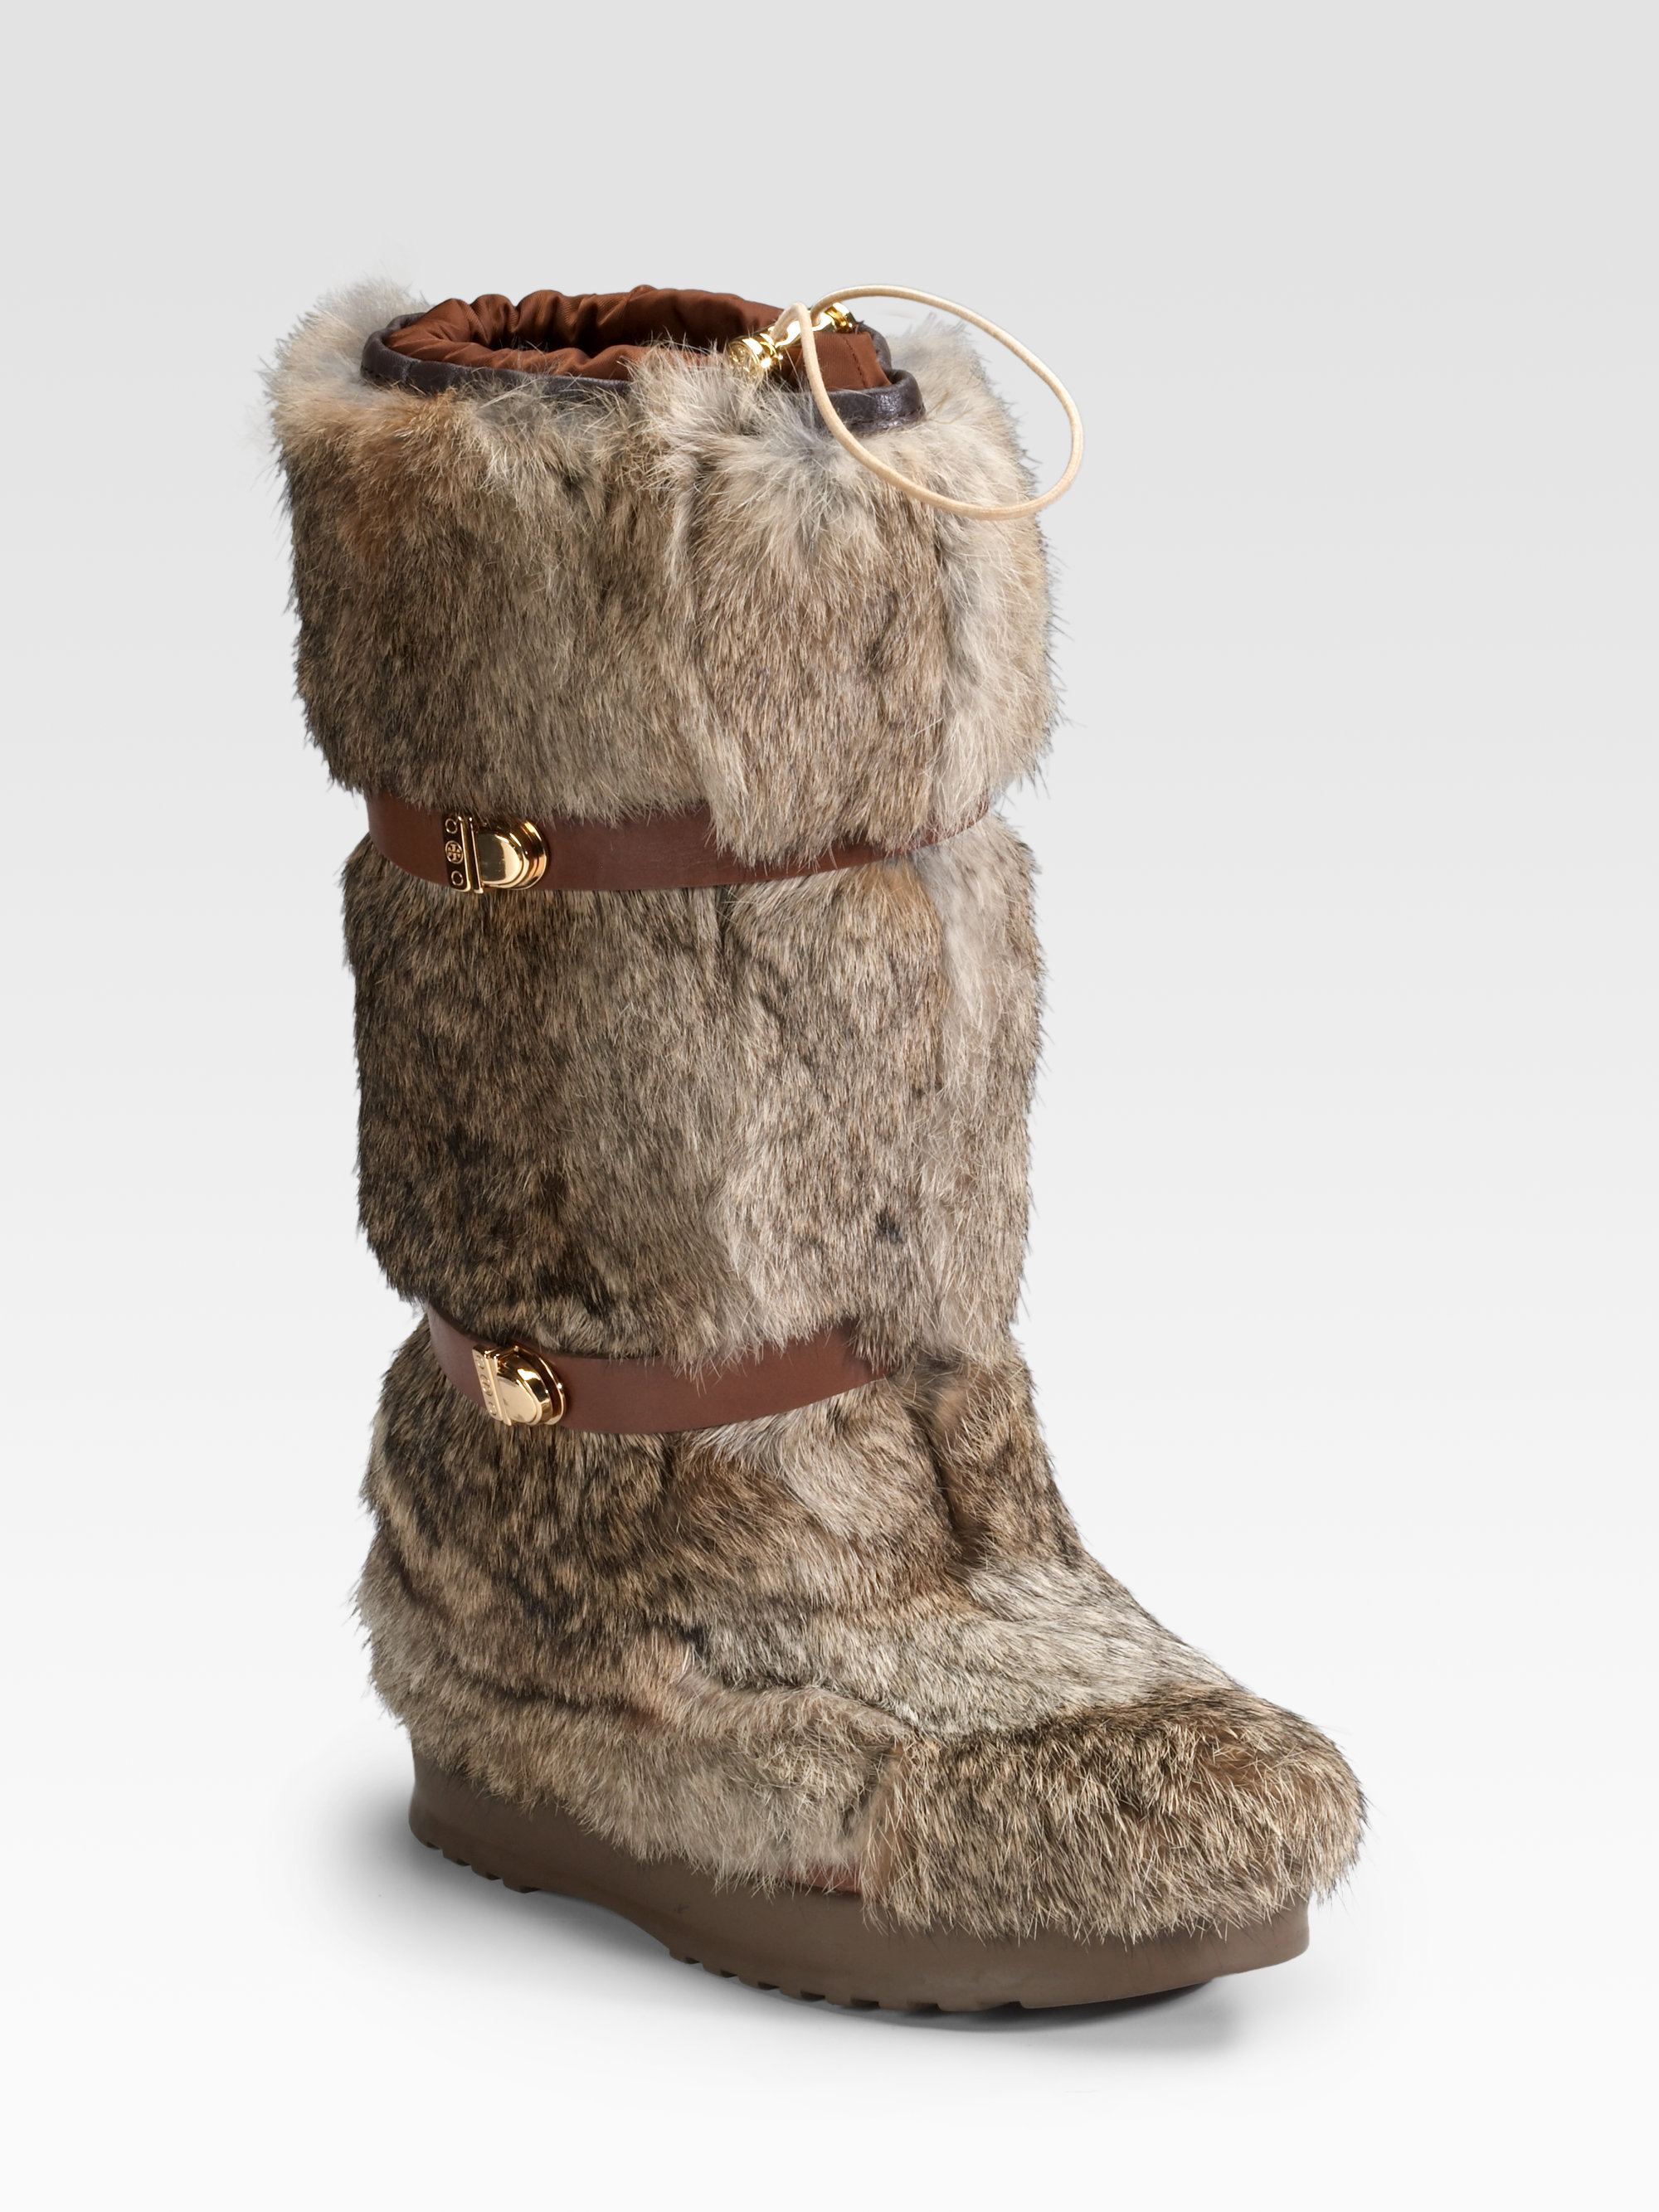 Lyst - Tory Burch Rabb... Ivanka Trump Shoes From China